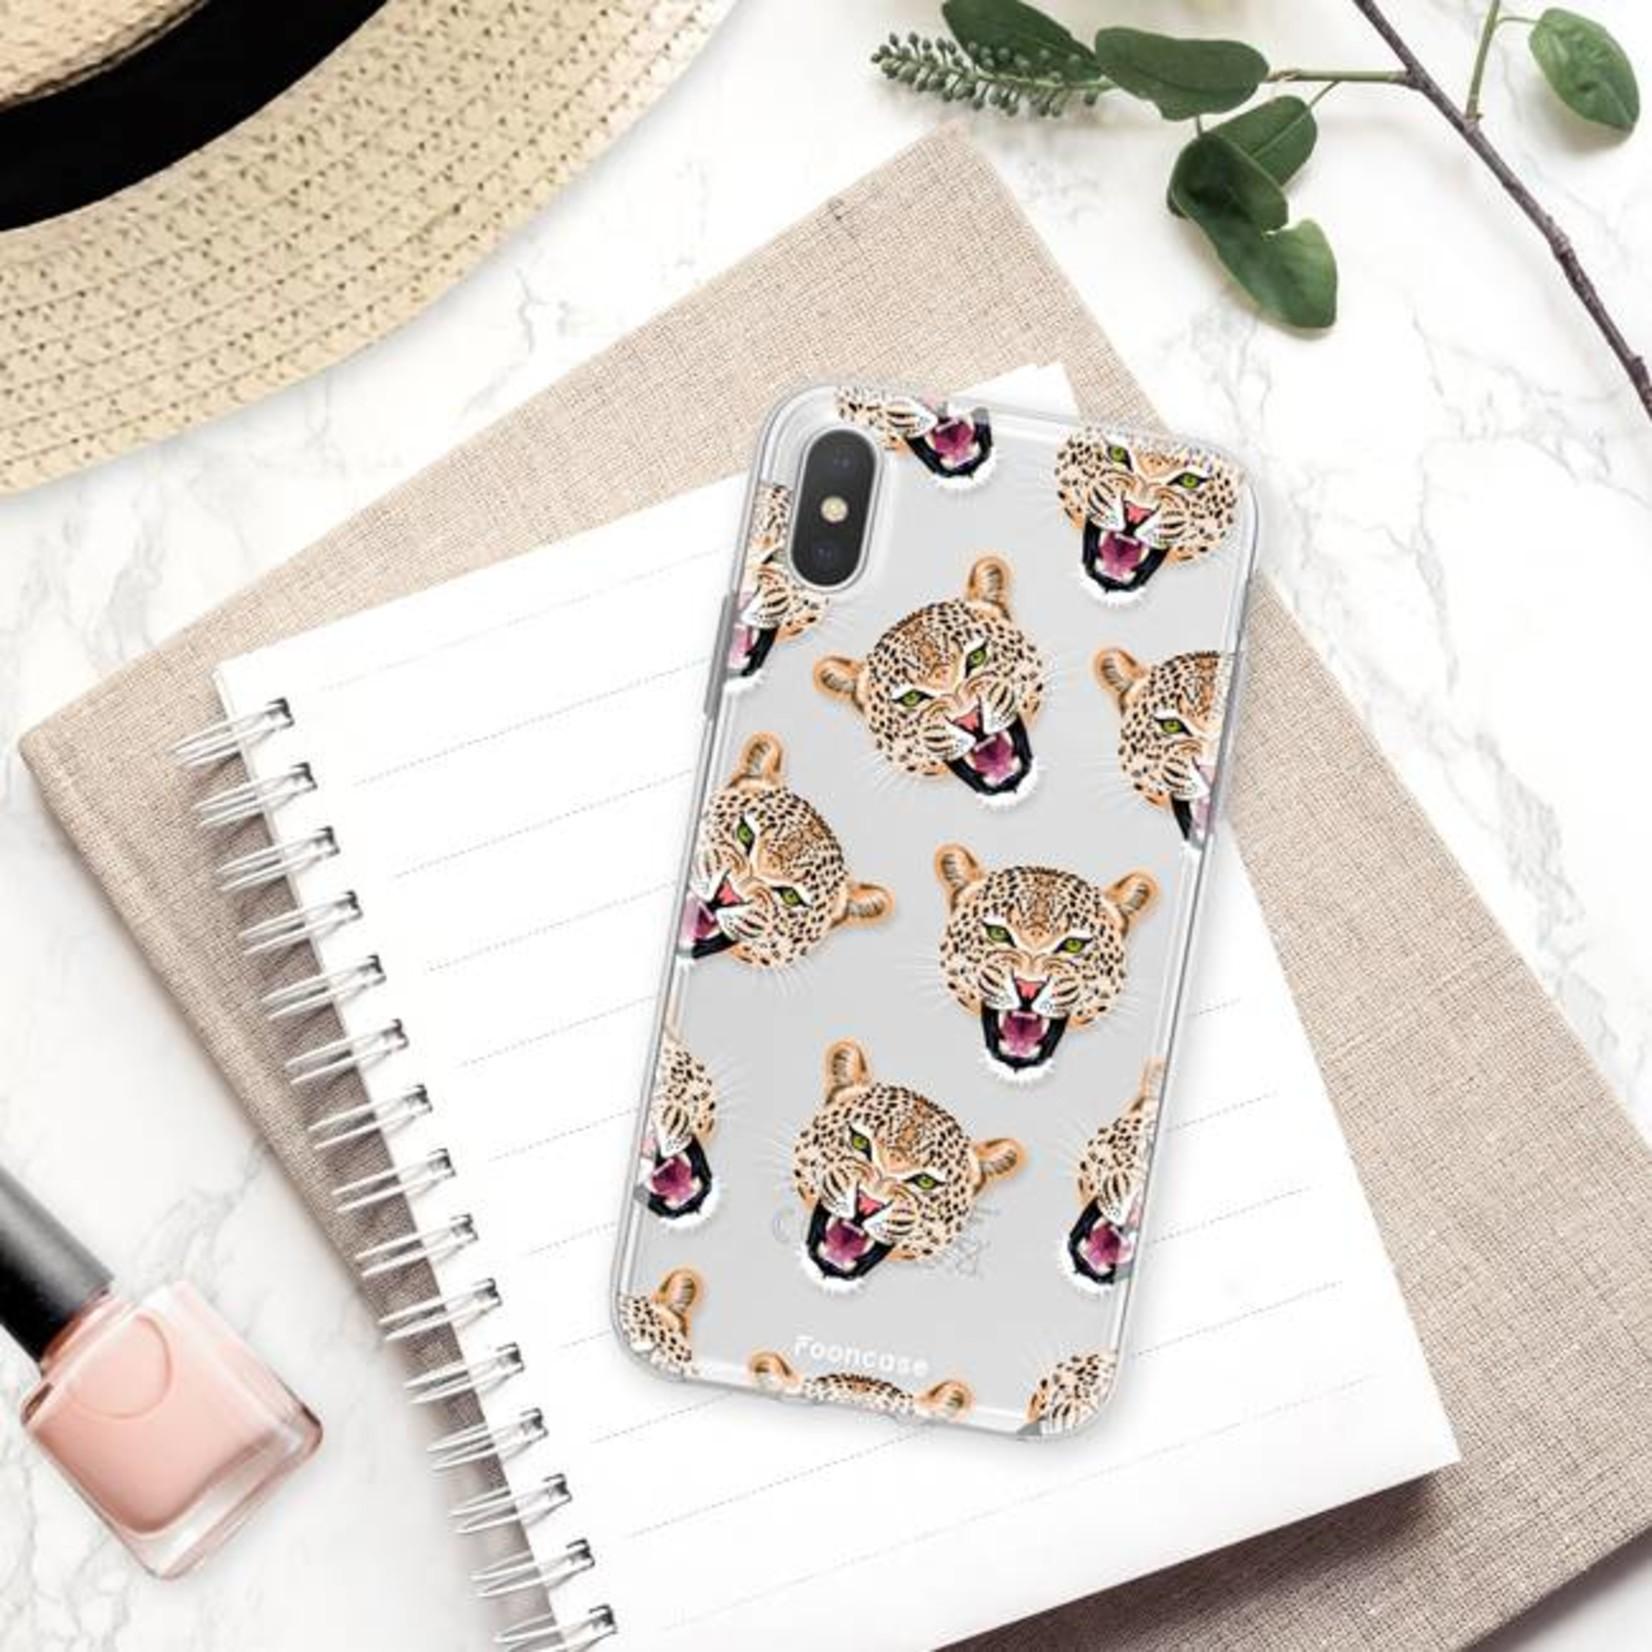 FOONCASE iPhone XS Max hoesje TPU Soft Case - Back Cover - Cheeky Leopard / Luipaard hoofden